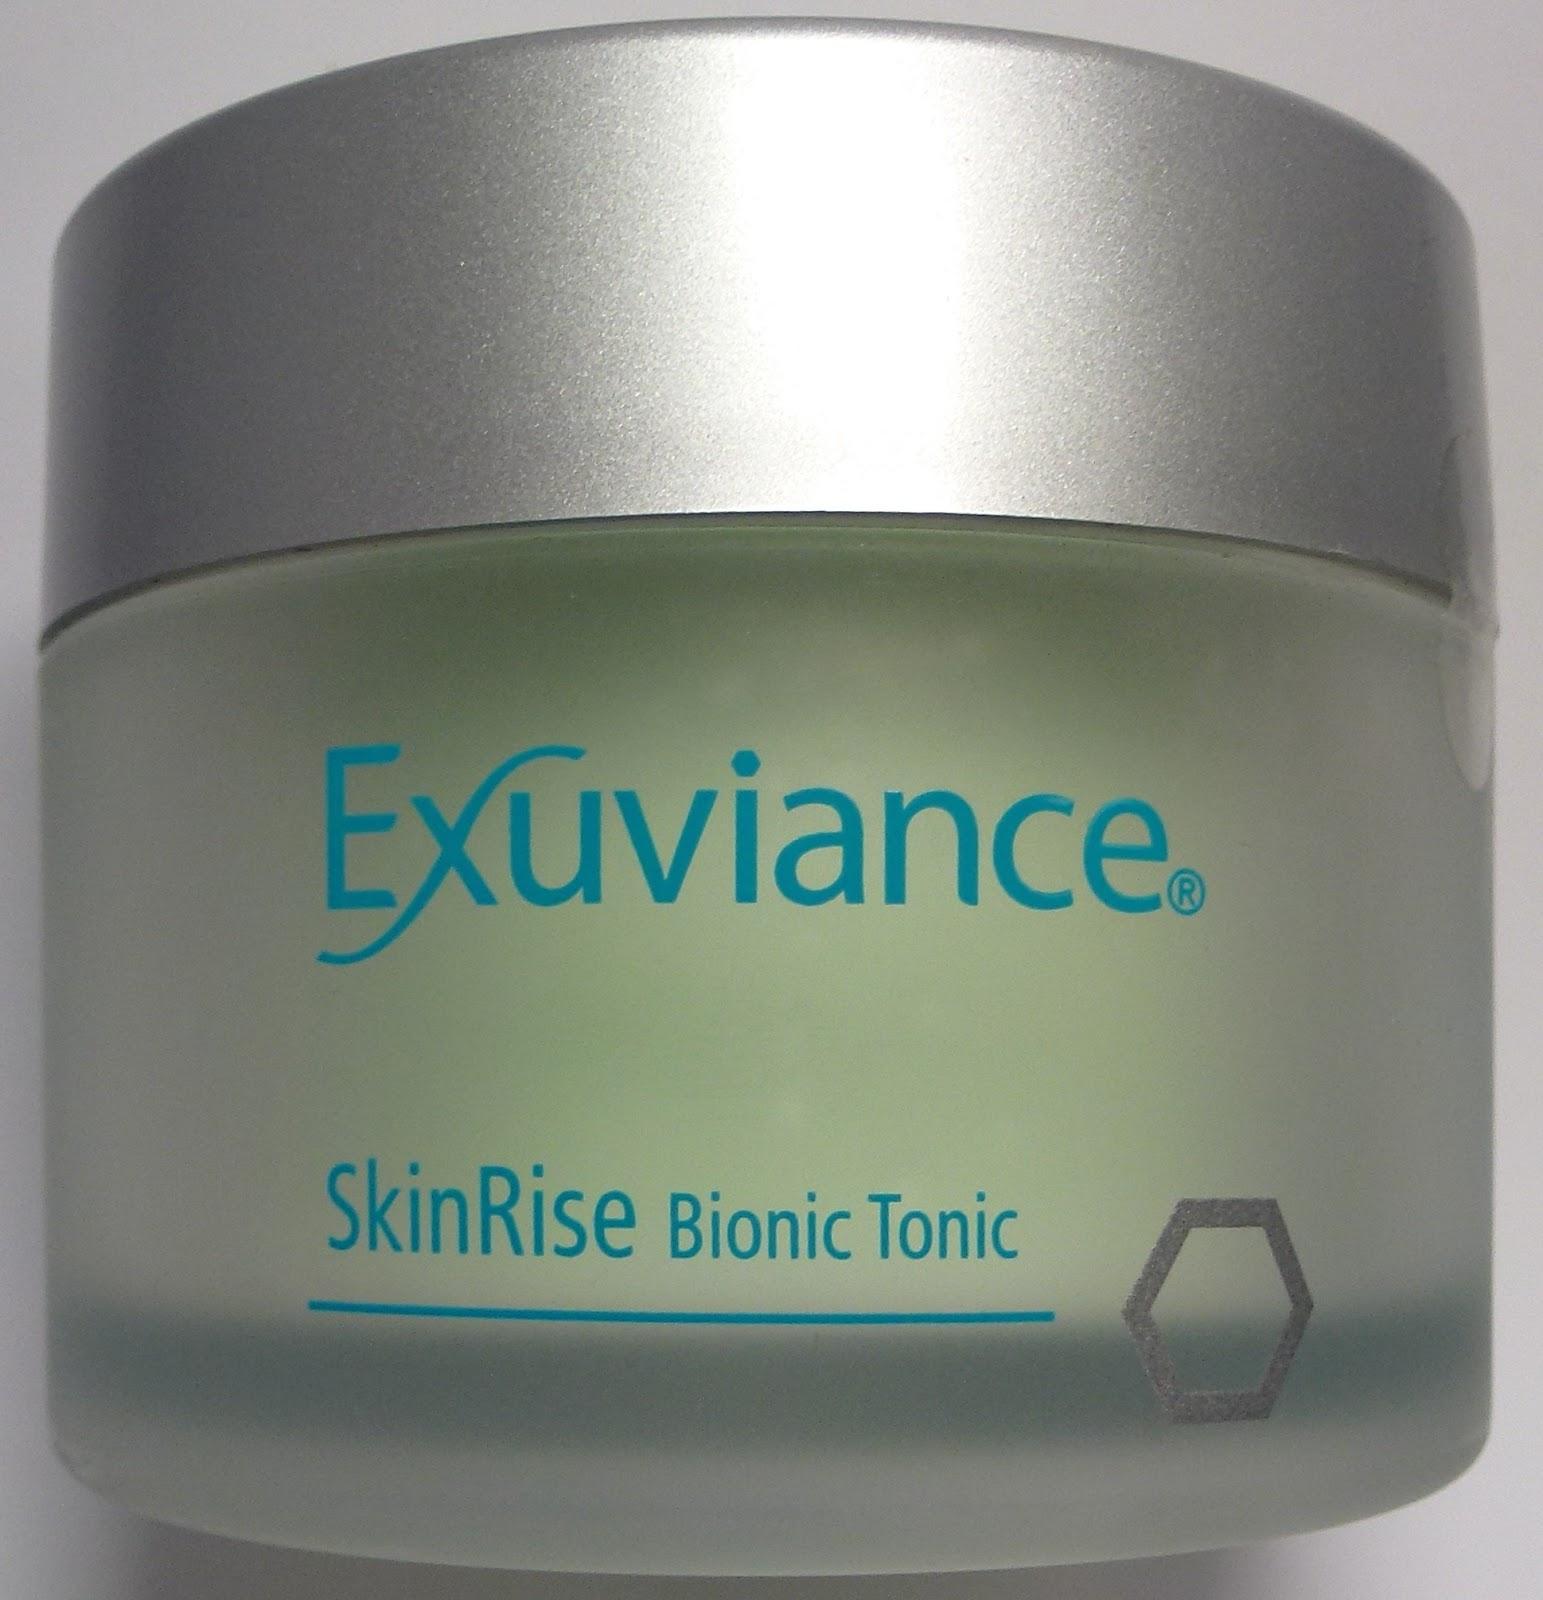 exuviance skinrise bionic tonic pads recension